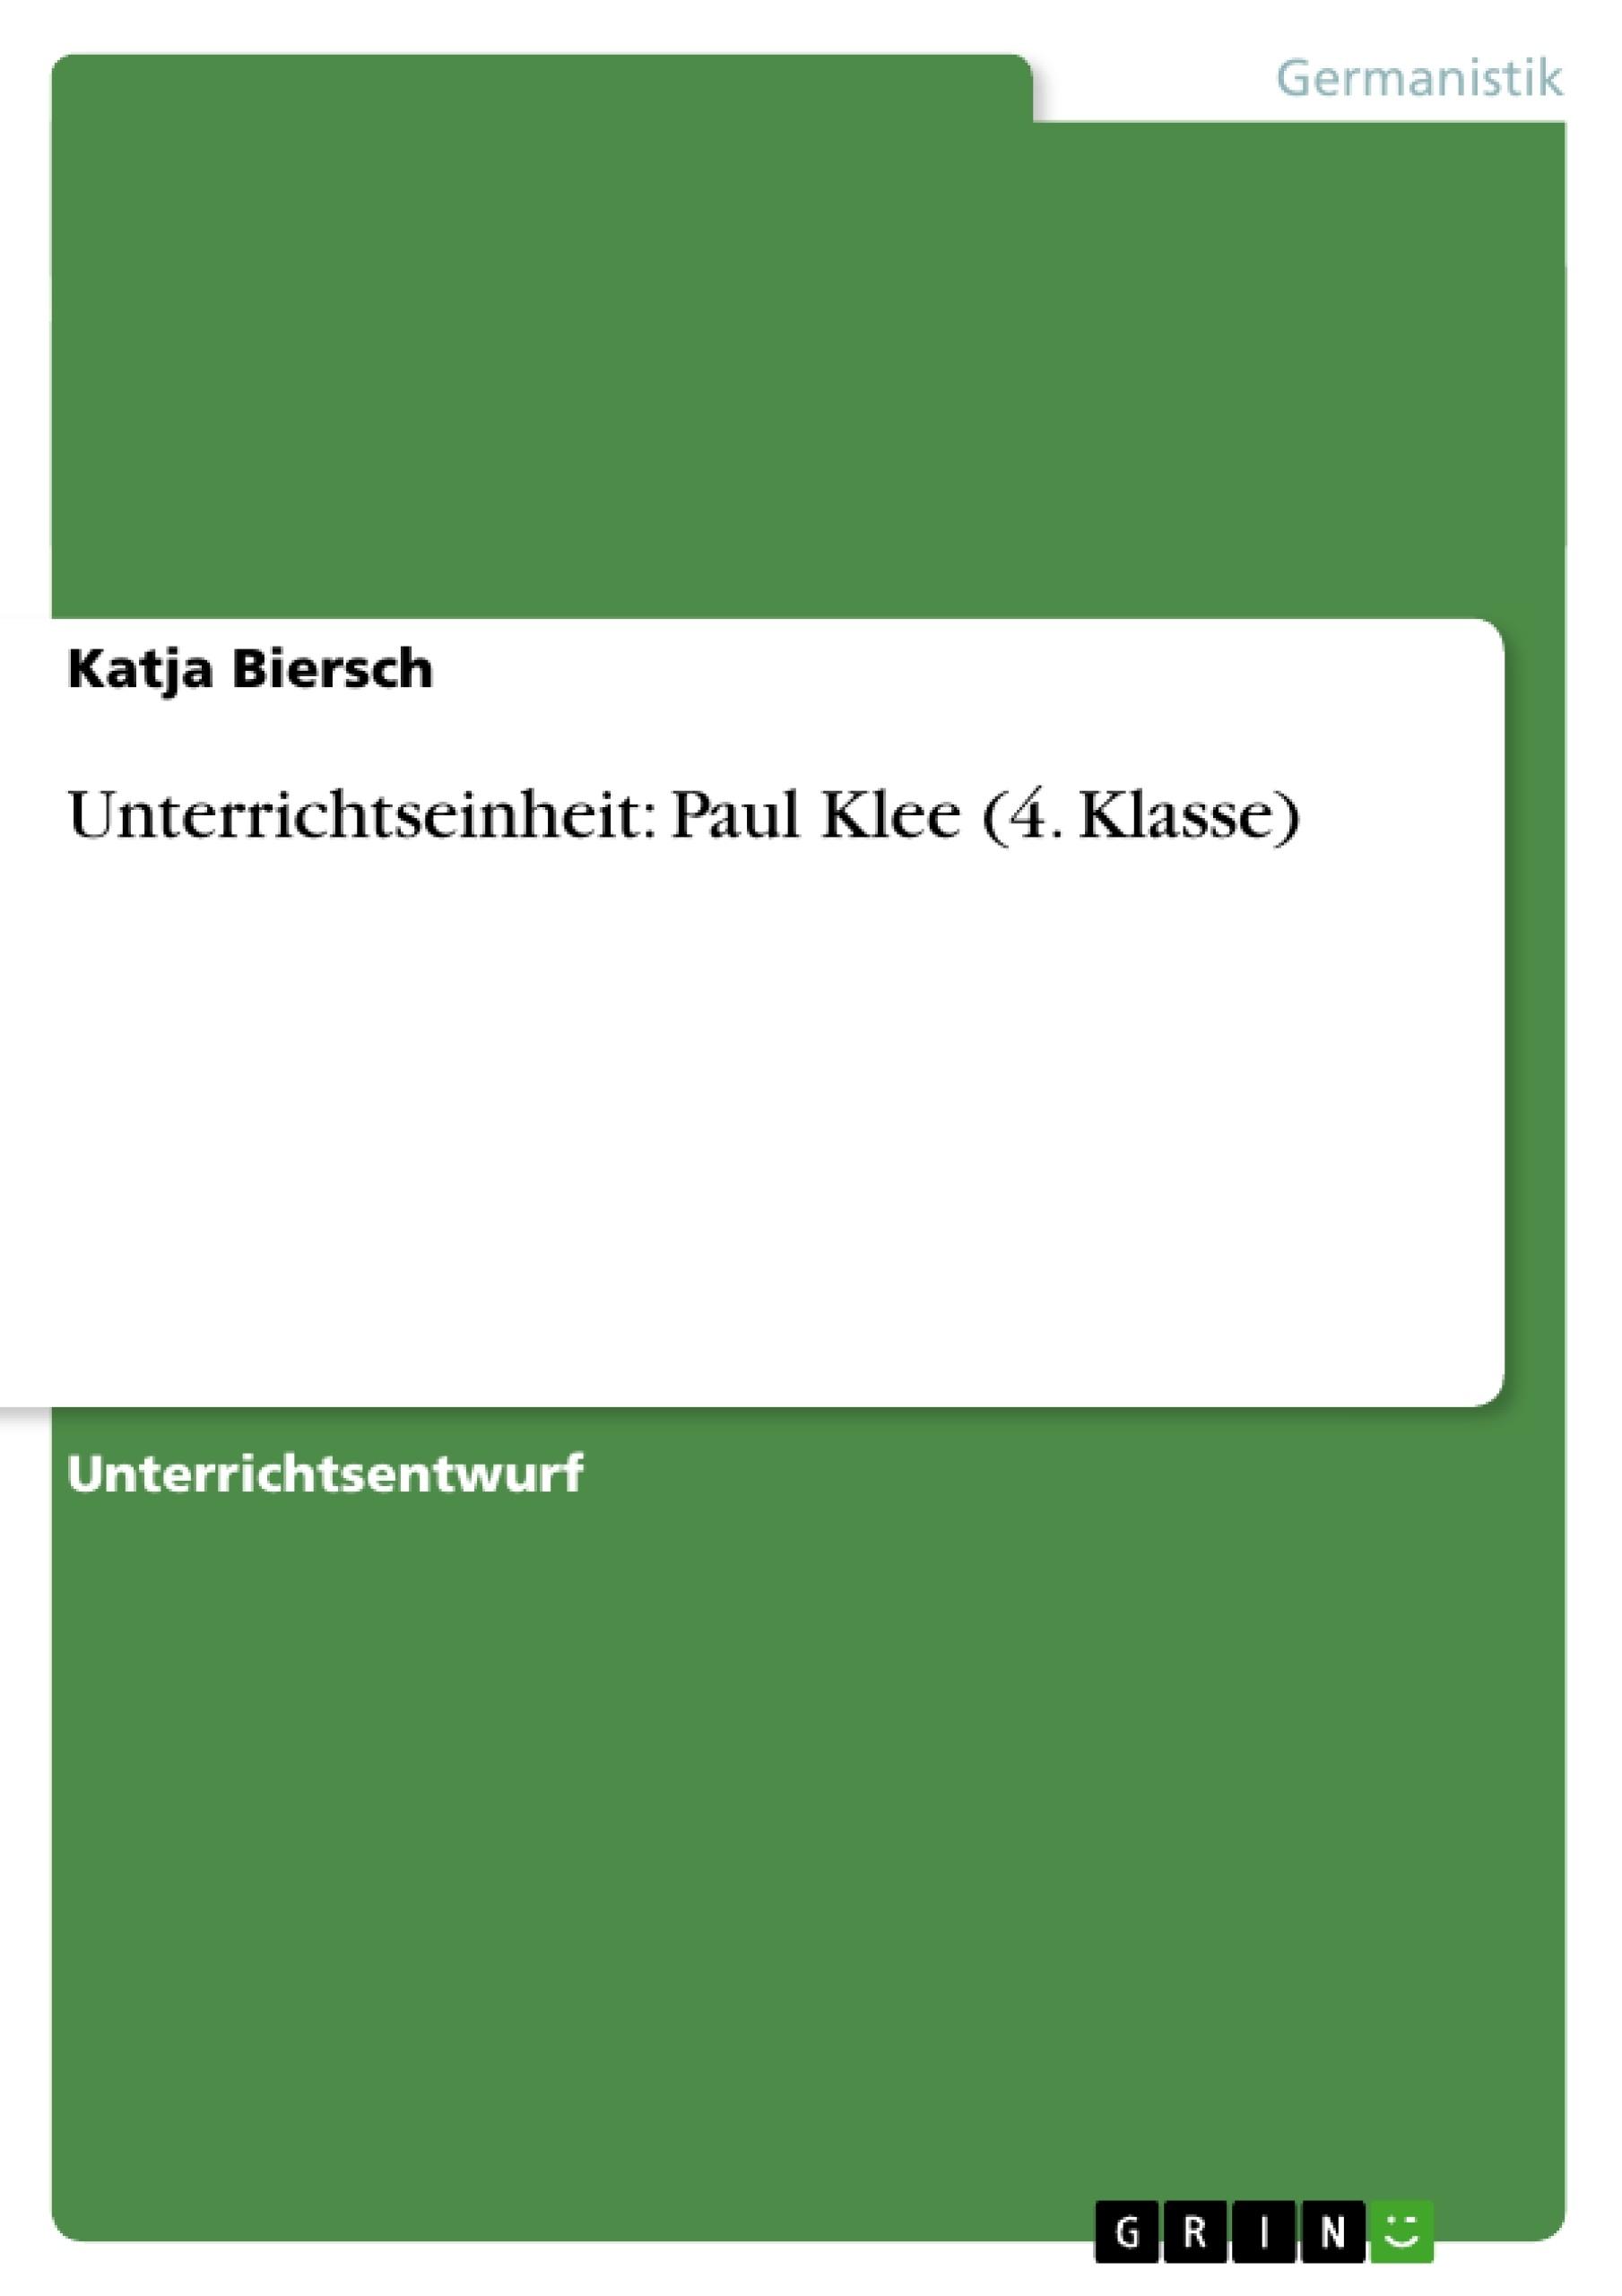 Titel: Unterrichtseinheit: Paul Klee (4. Klasse)